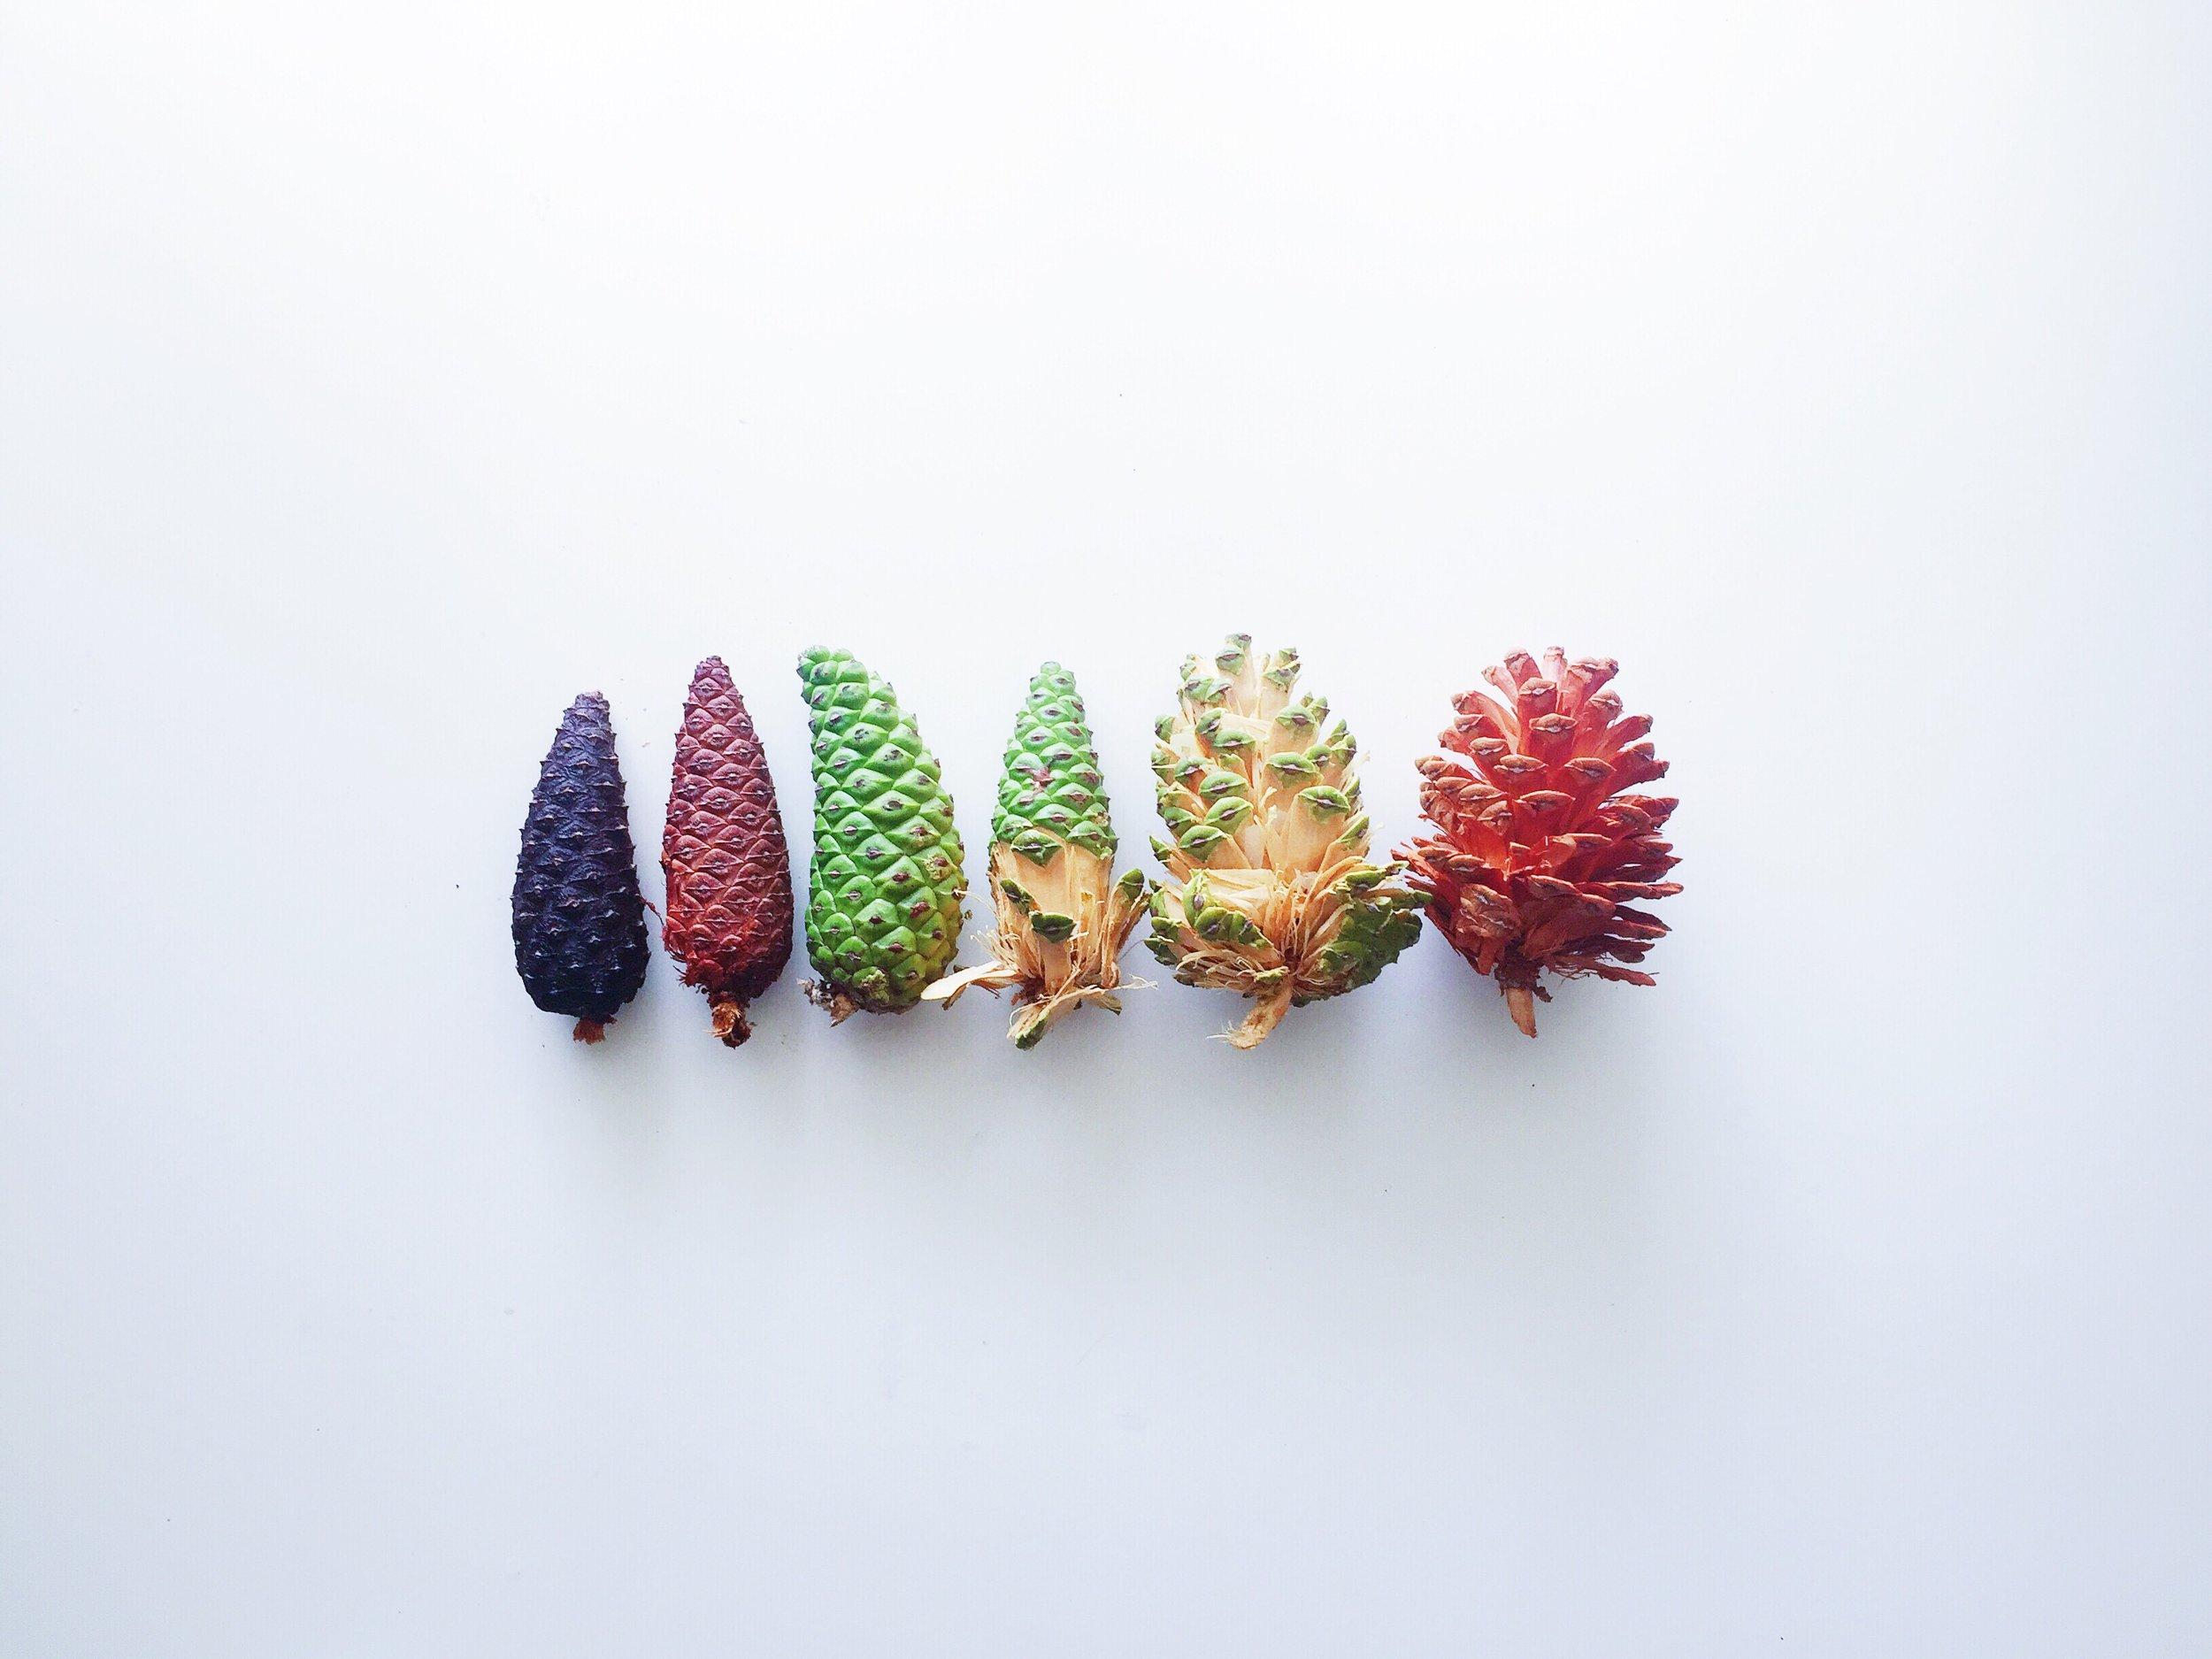 pine-cone-evolution_t20_VoXgvl.jpg